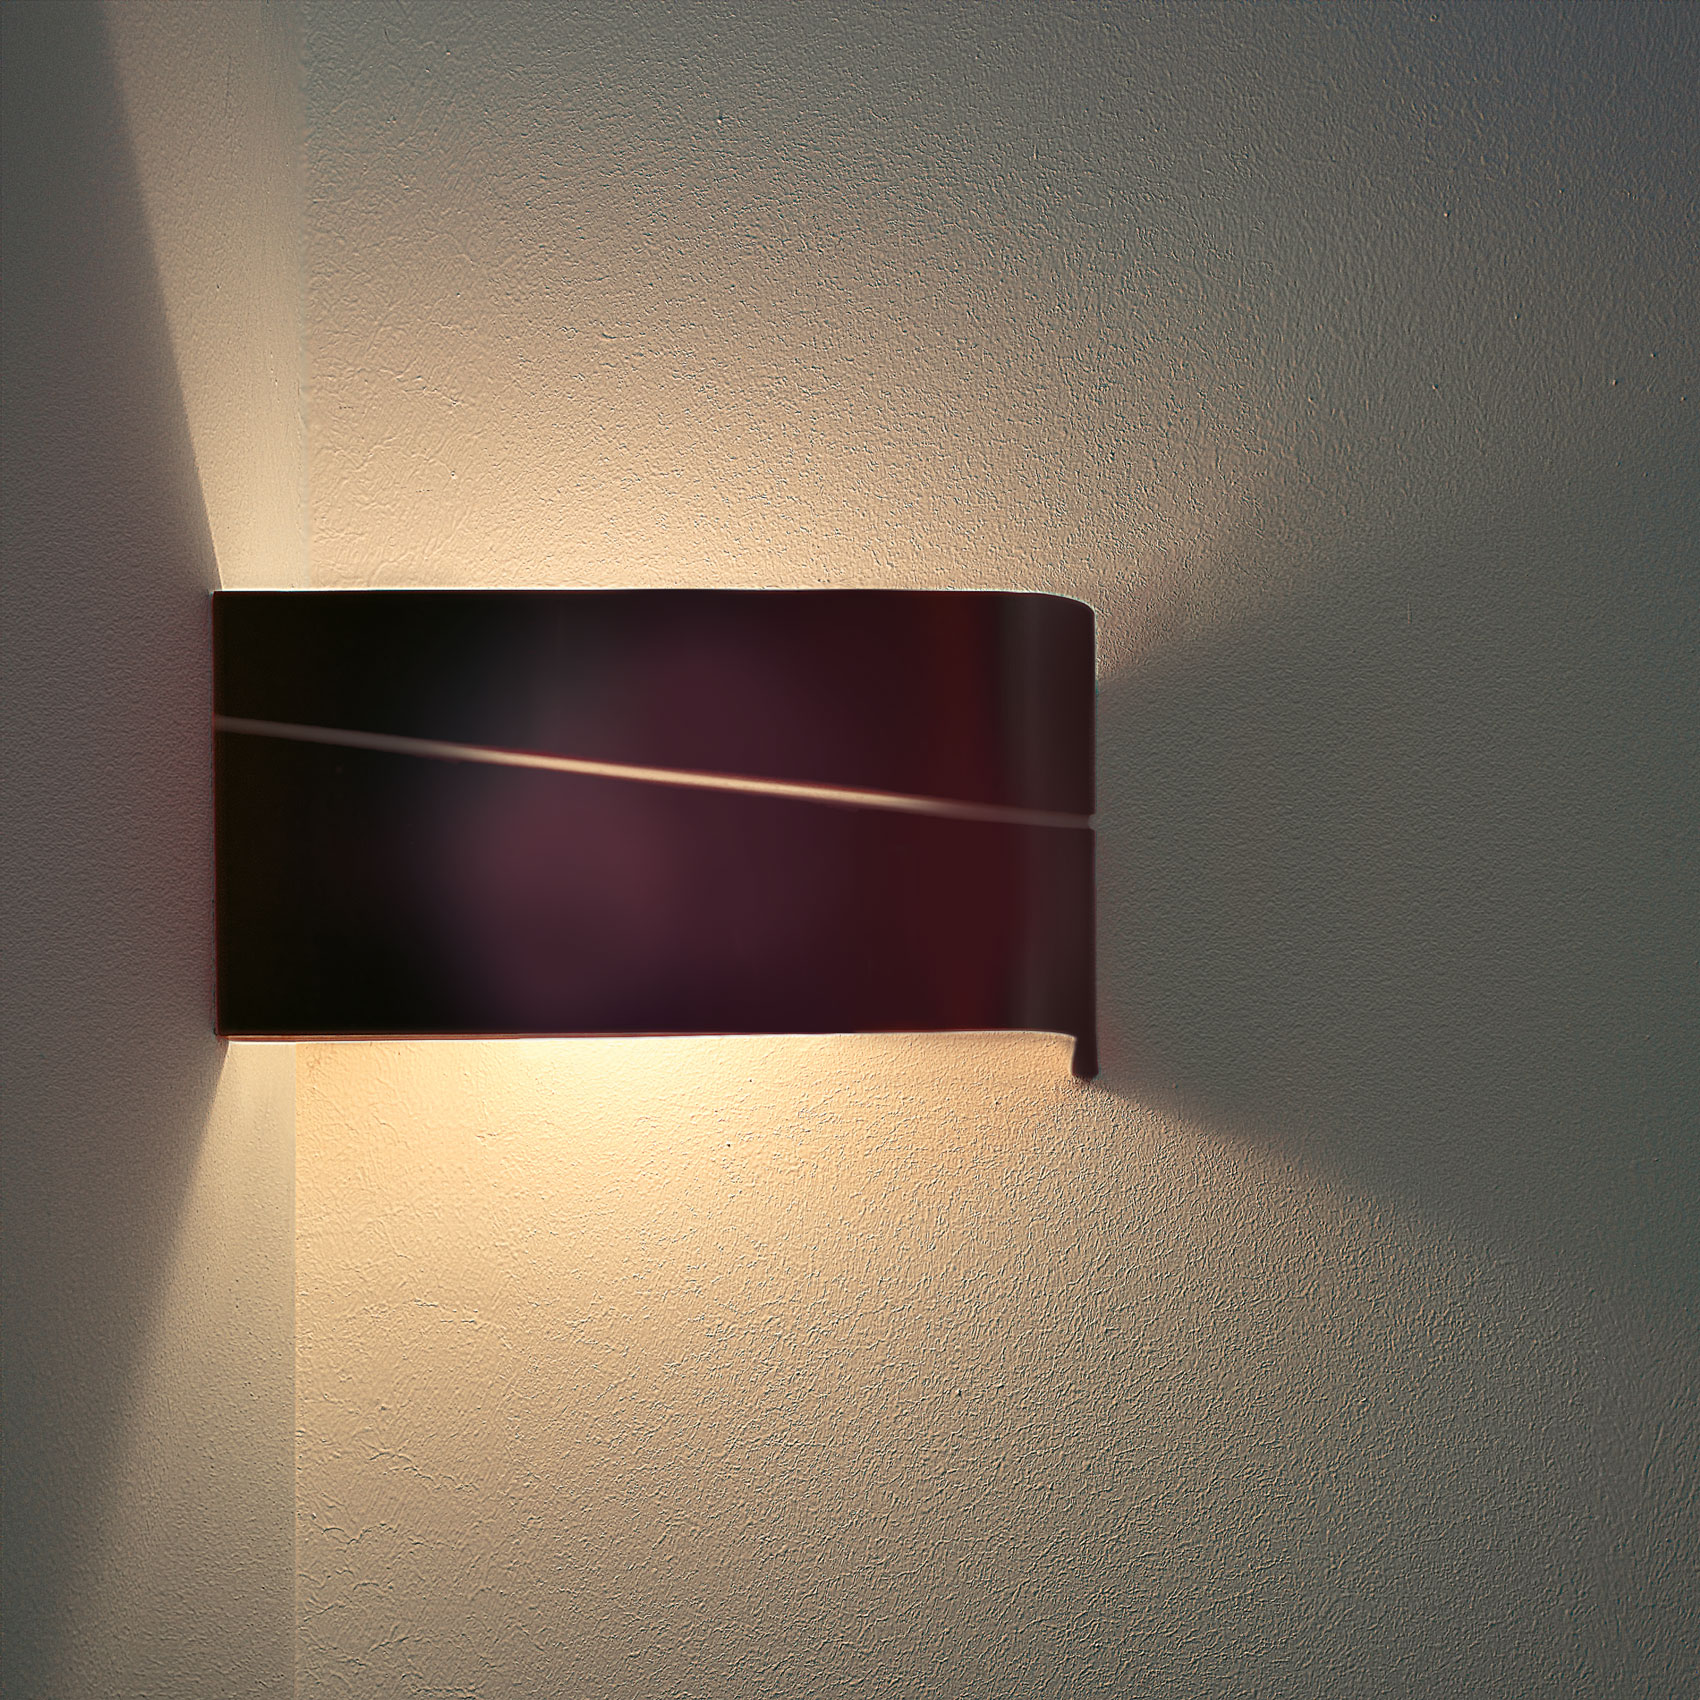 marco-zito-steelon-03